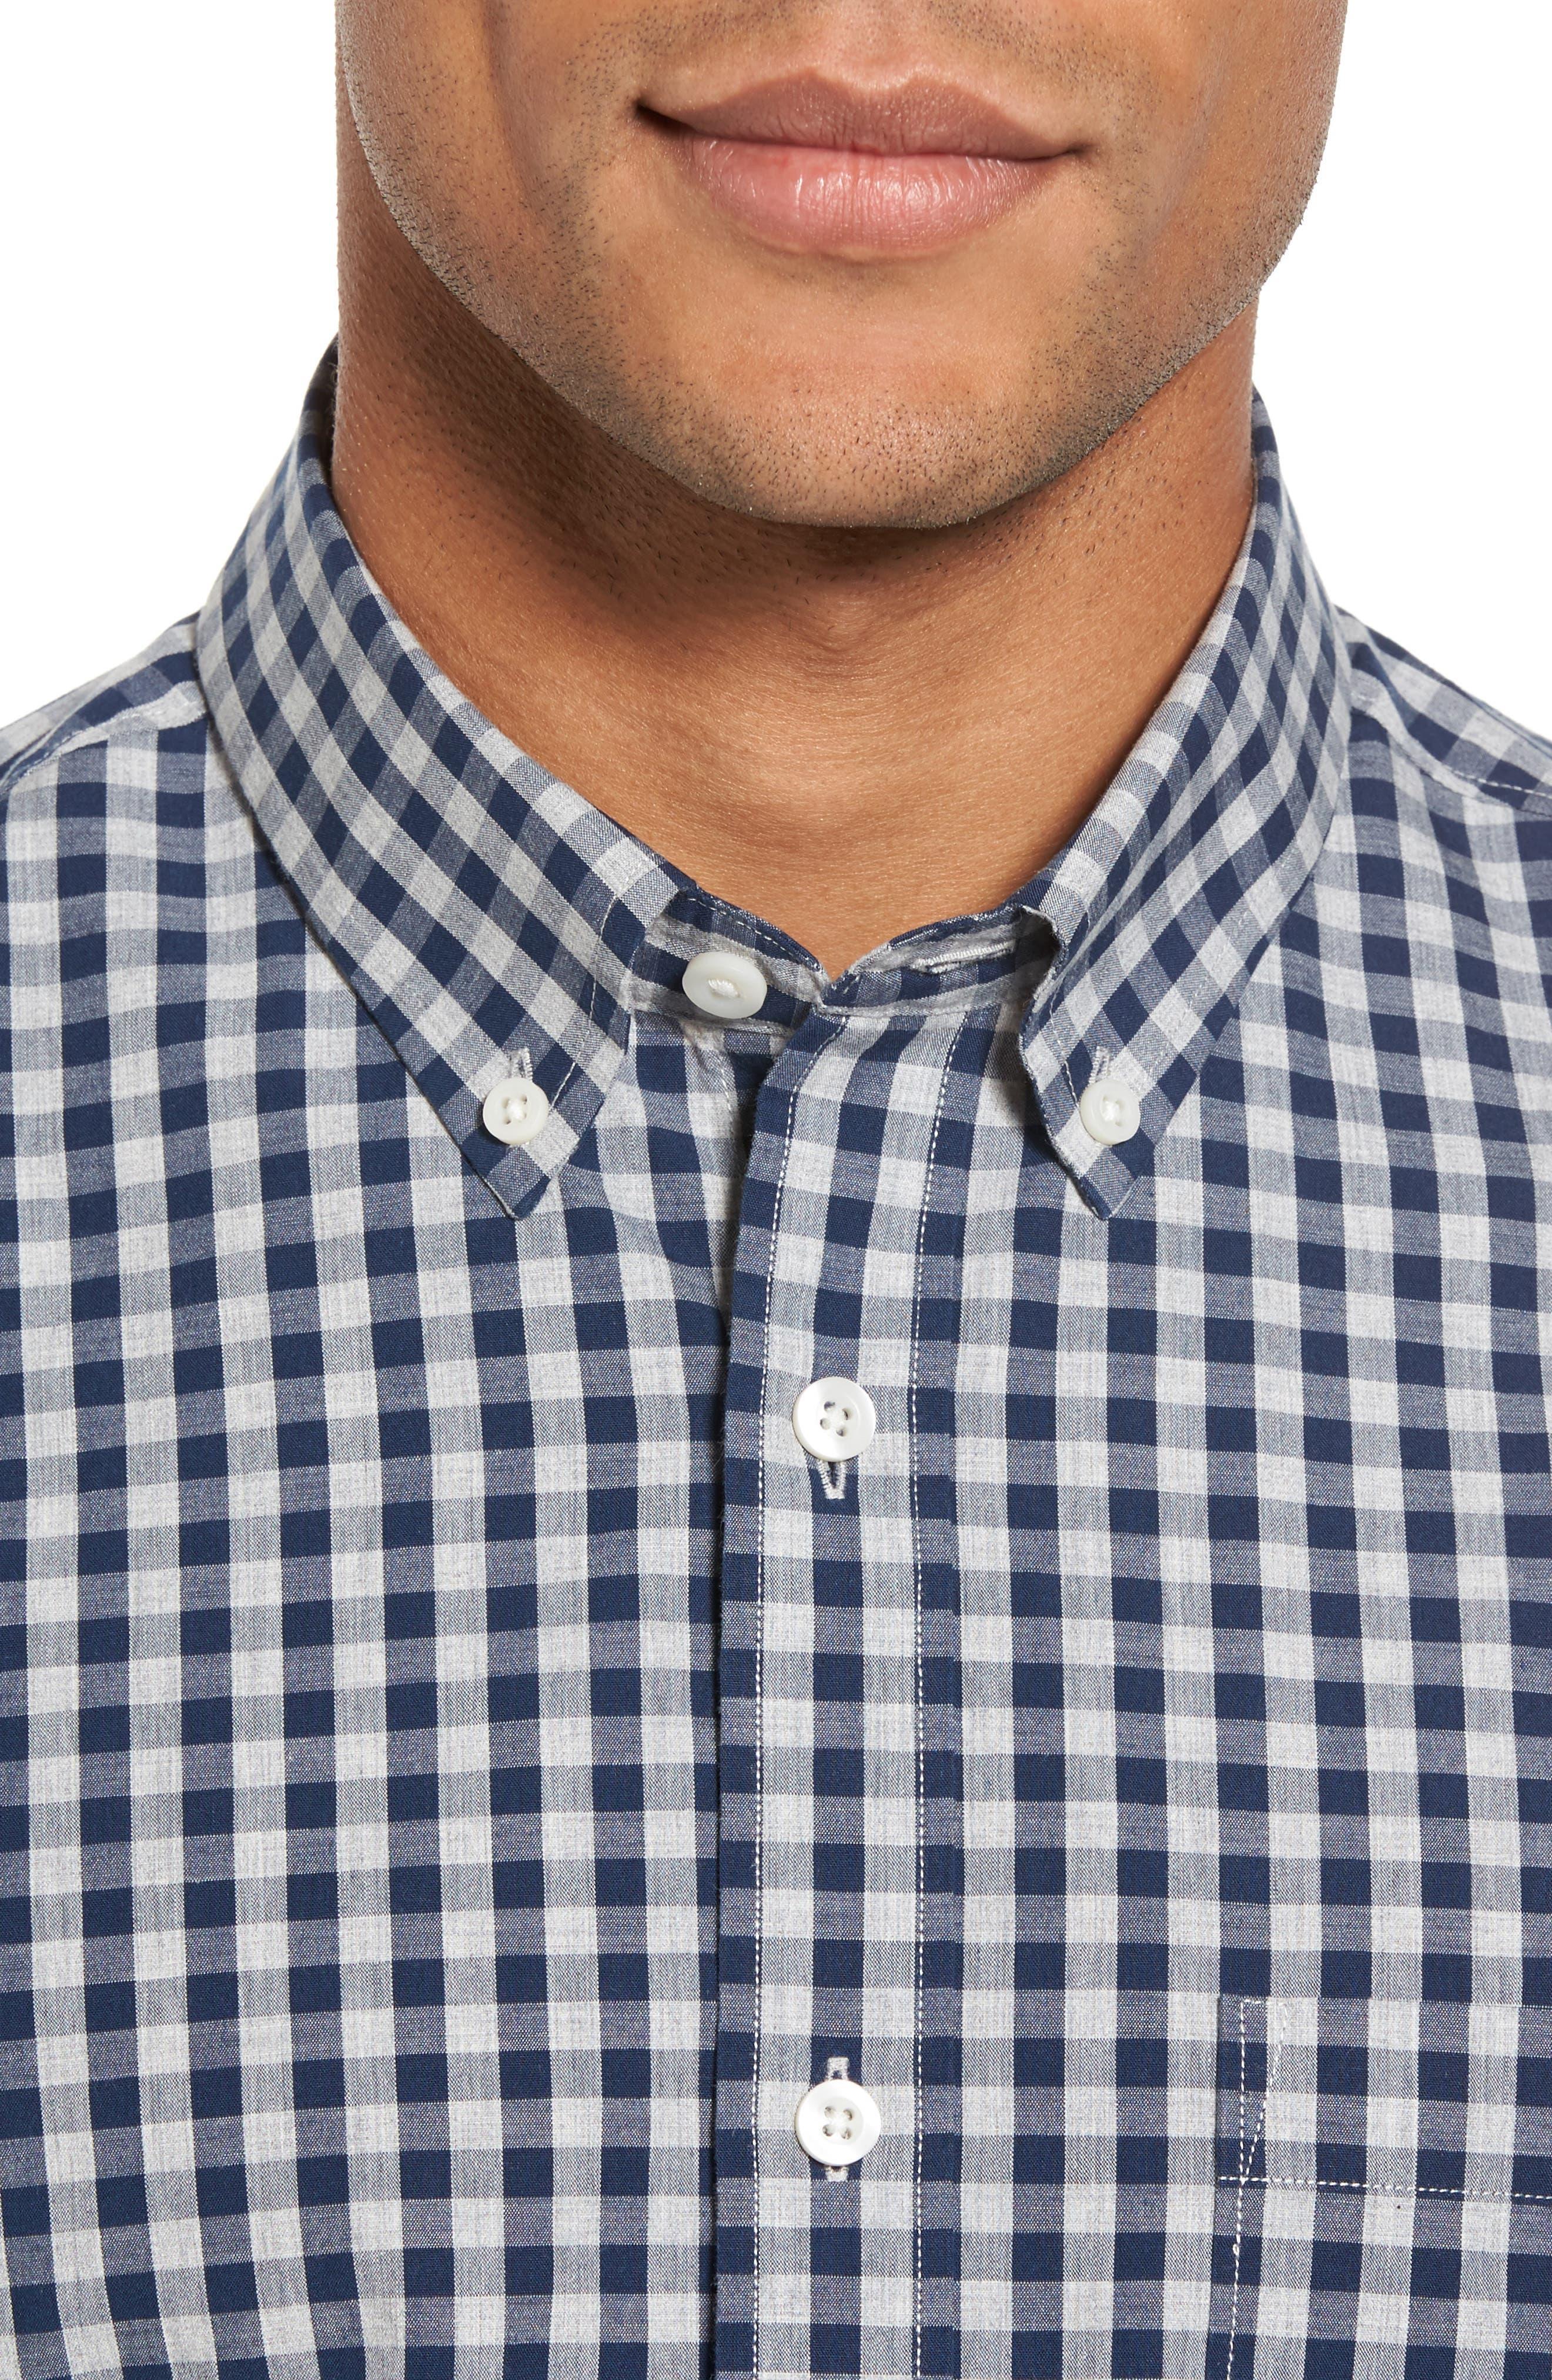 Spade Trim Fit Gingham Check Sport Shirt,                             Alternate thumbnail 4, color,                             030